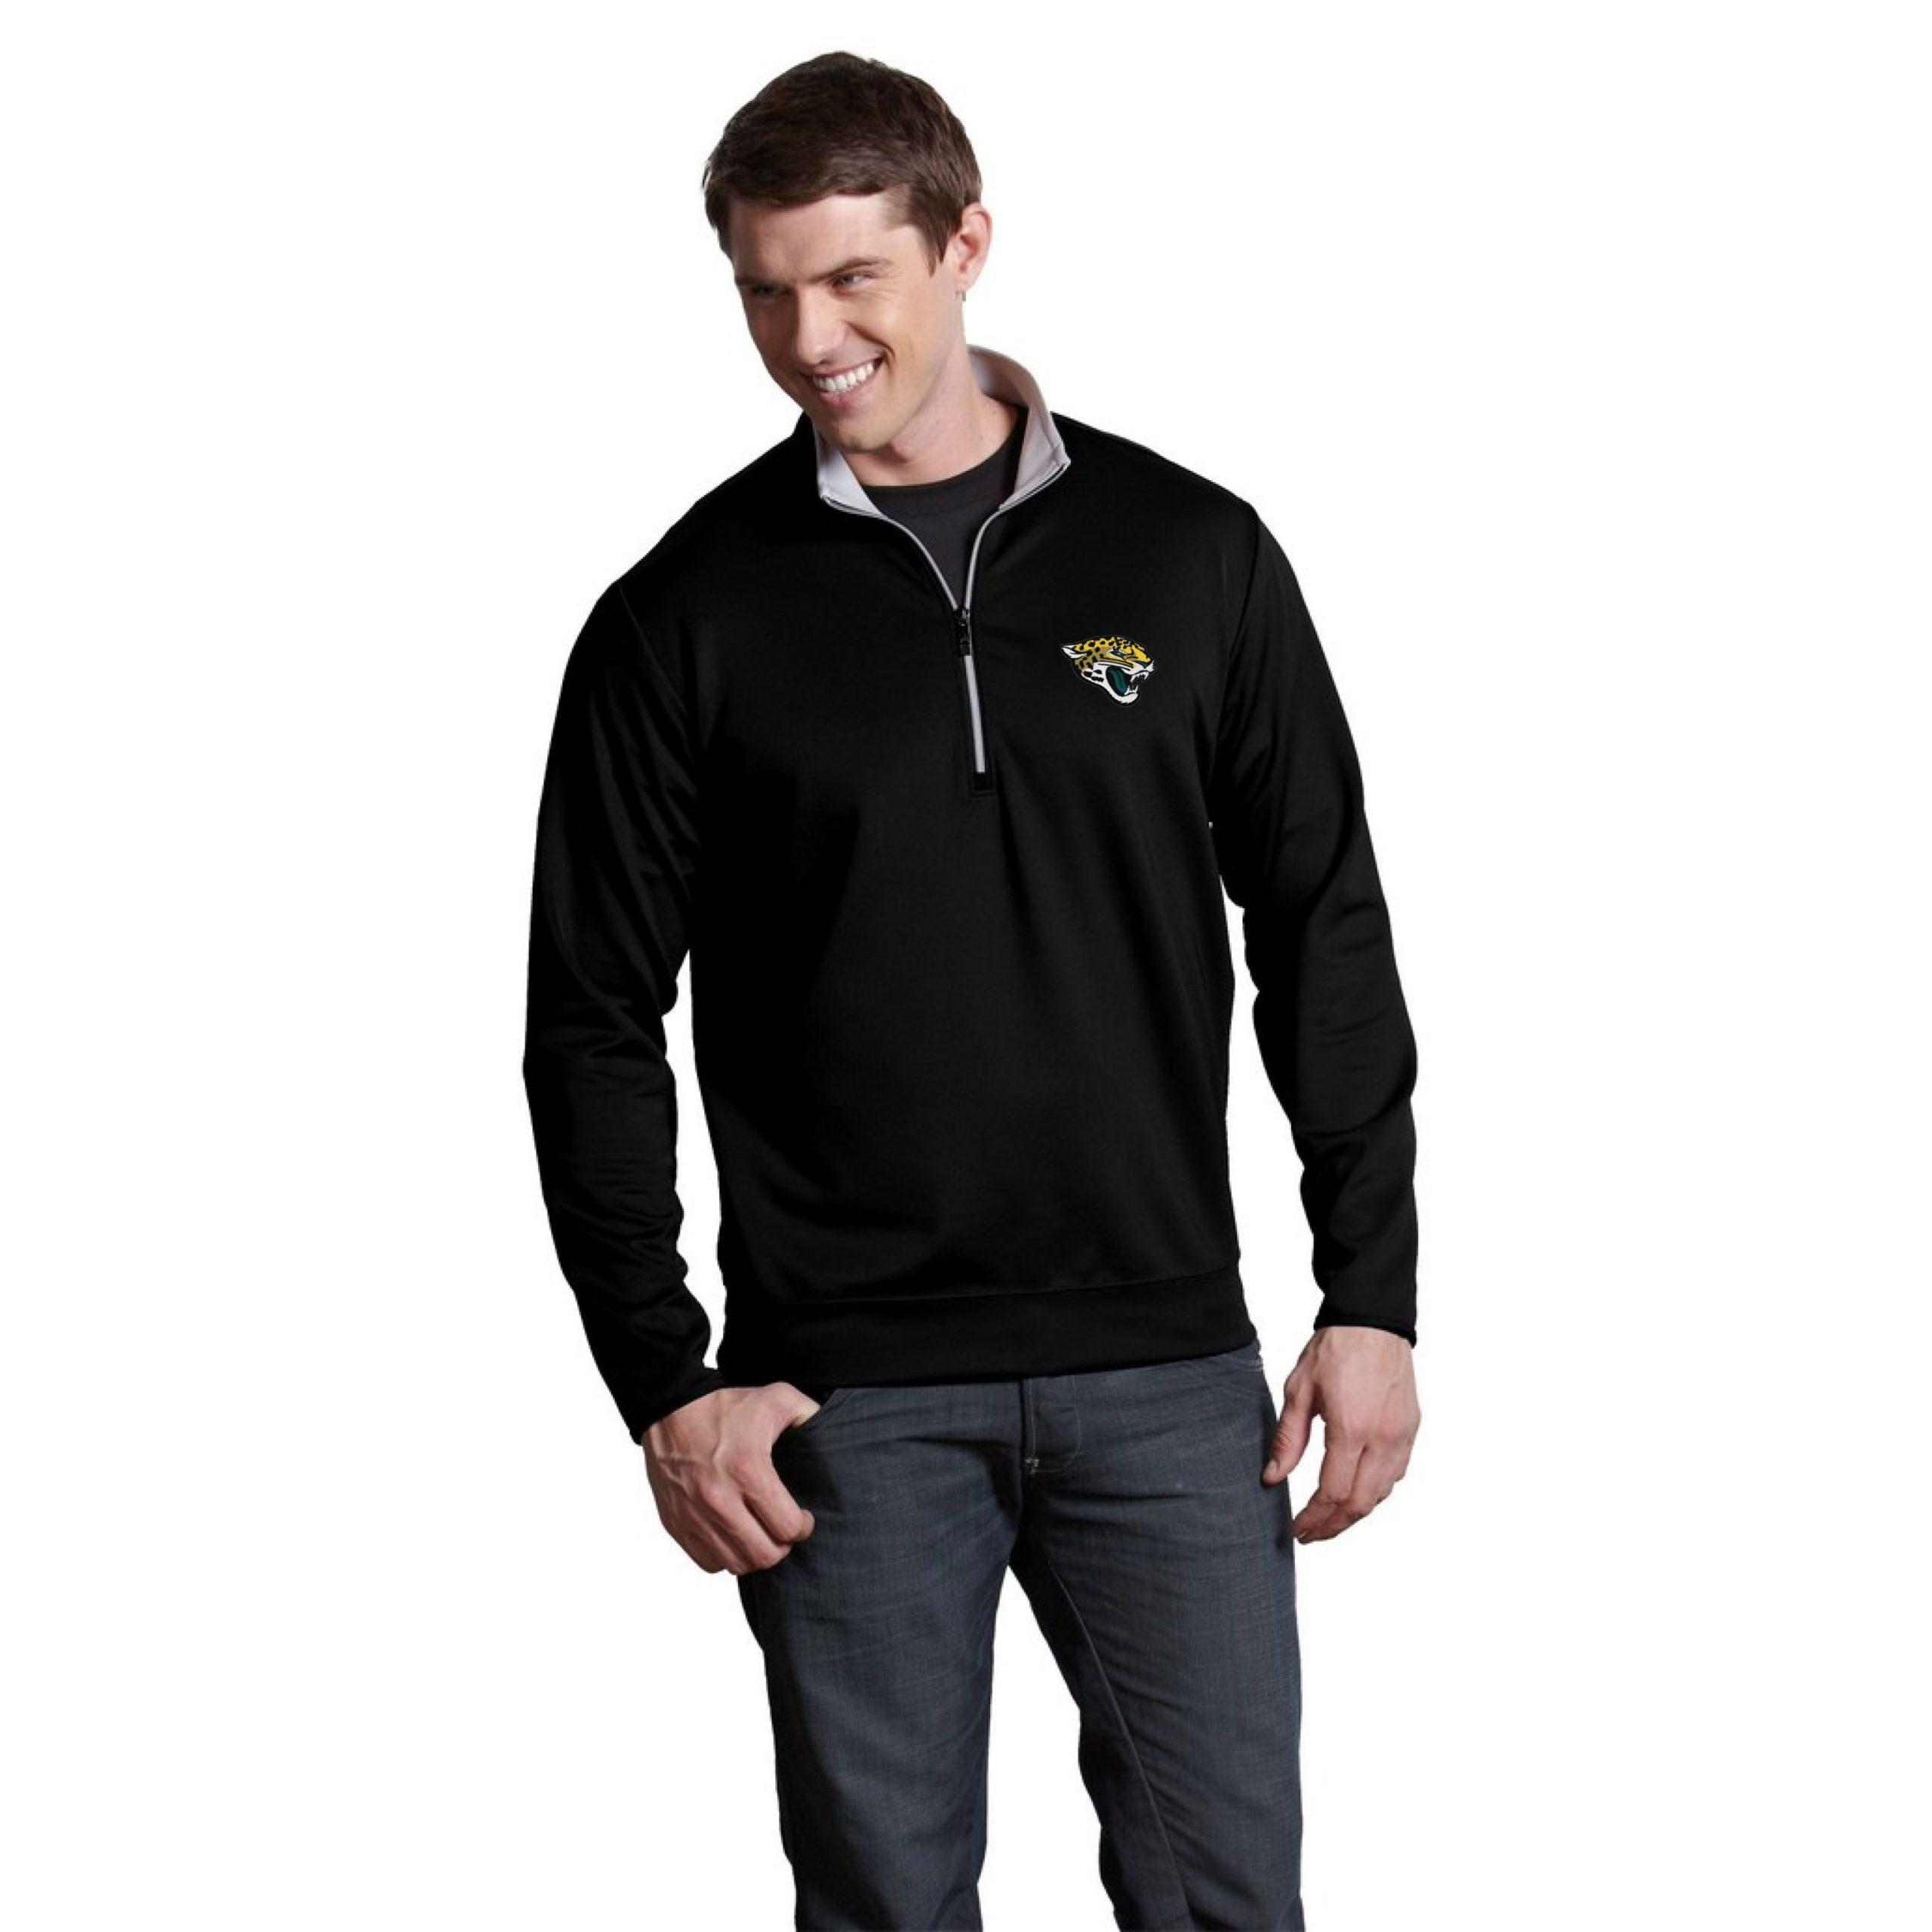 Jacksonville Jaguars Antigua Leader Quarter-Zip Pullover Jacket - Black